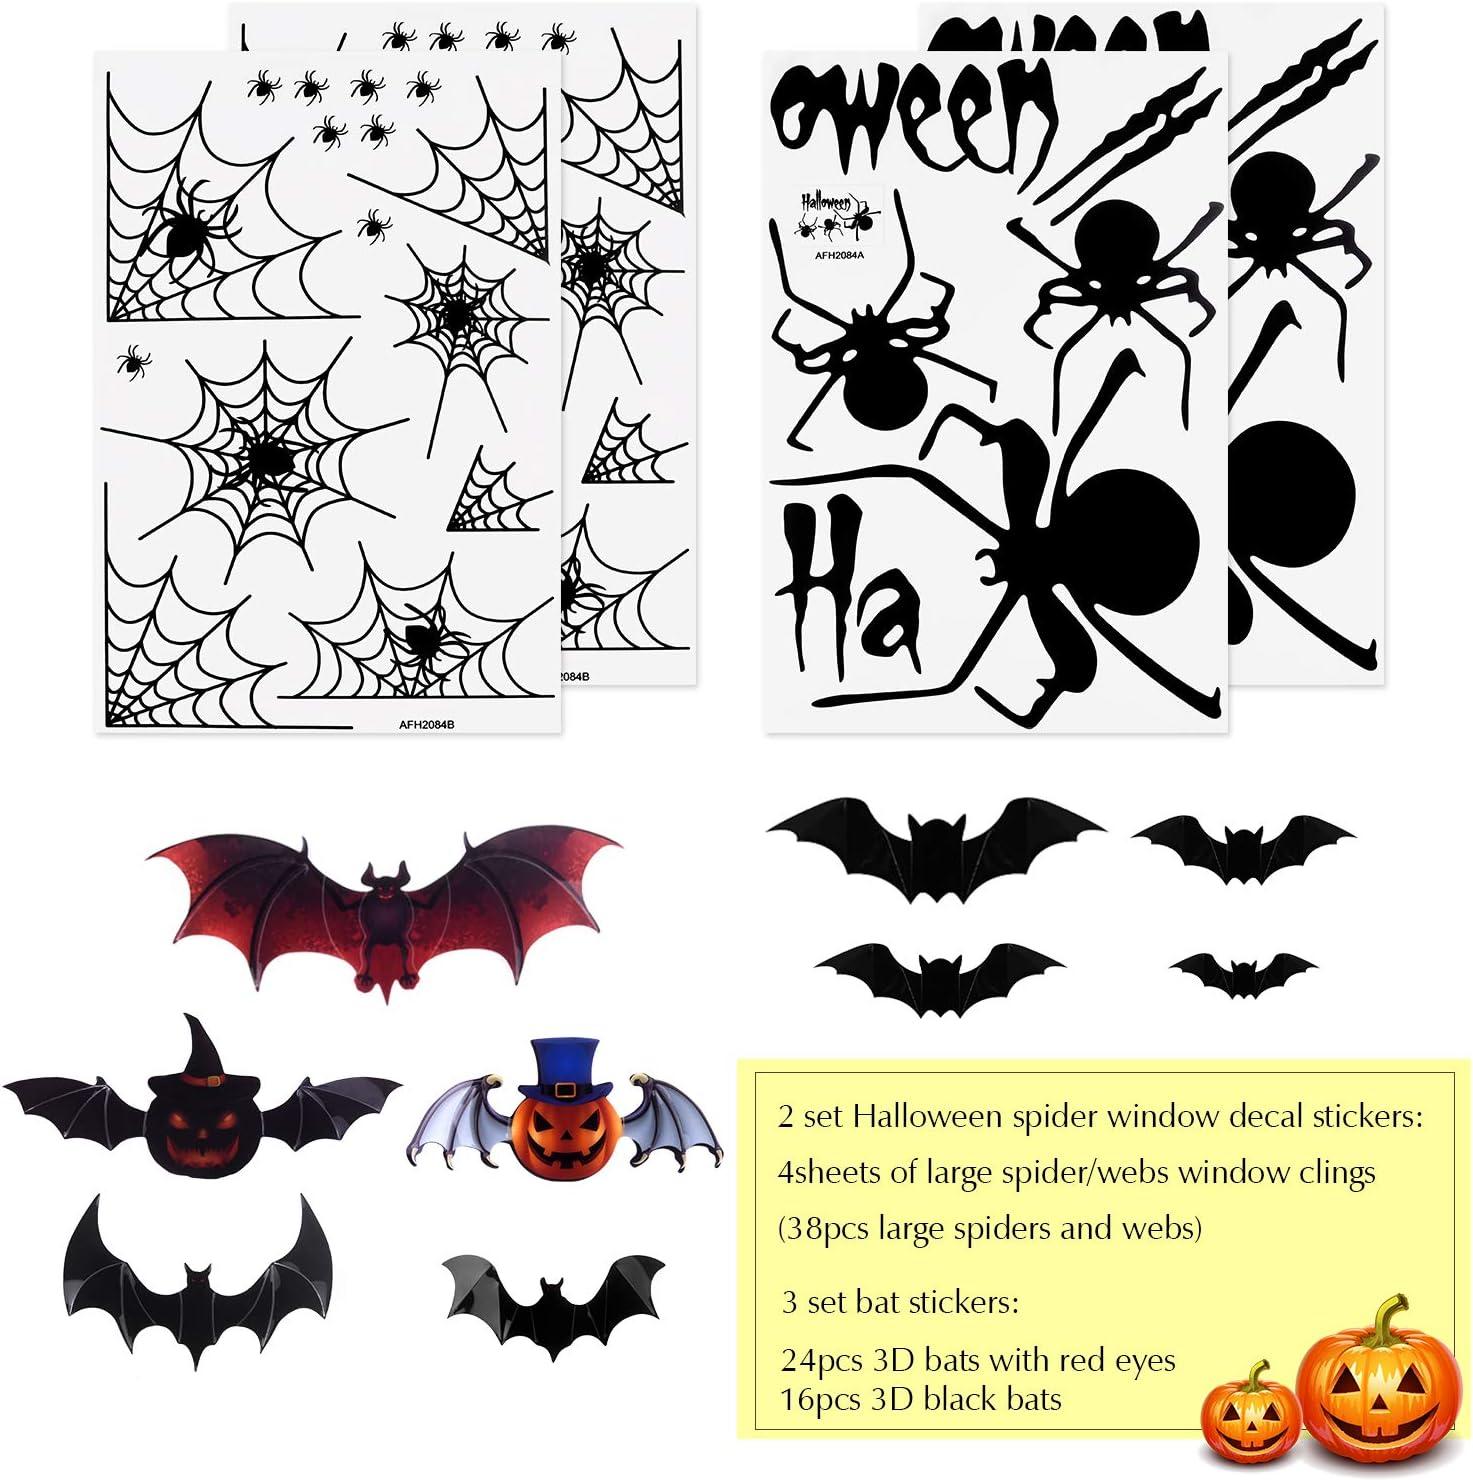 Spiders web MDF wall art window decoration craft shape halloween party